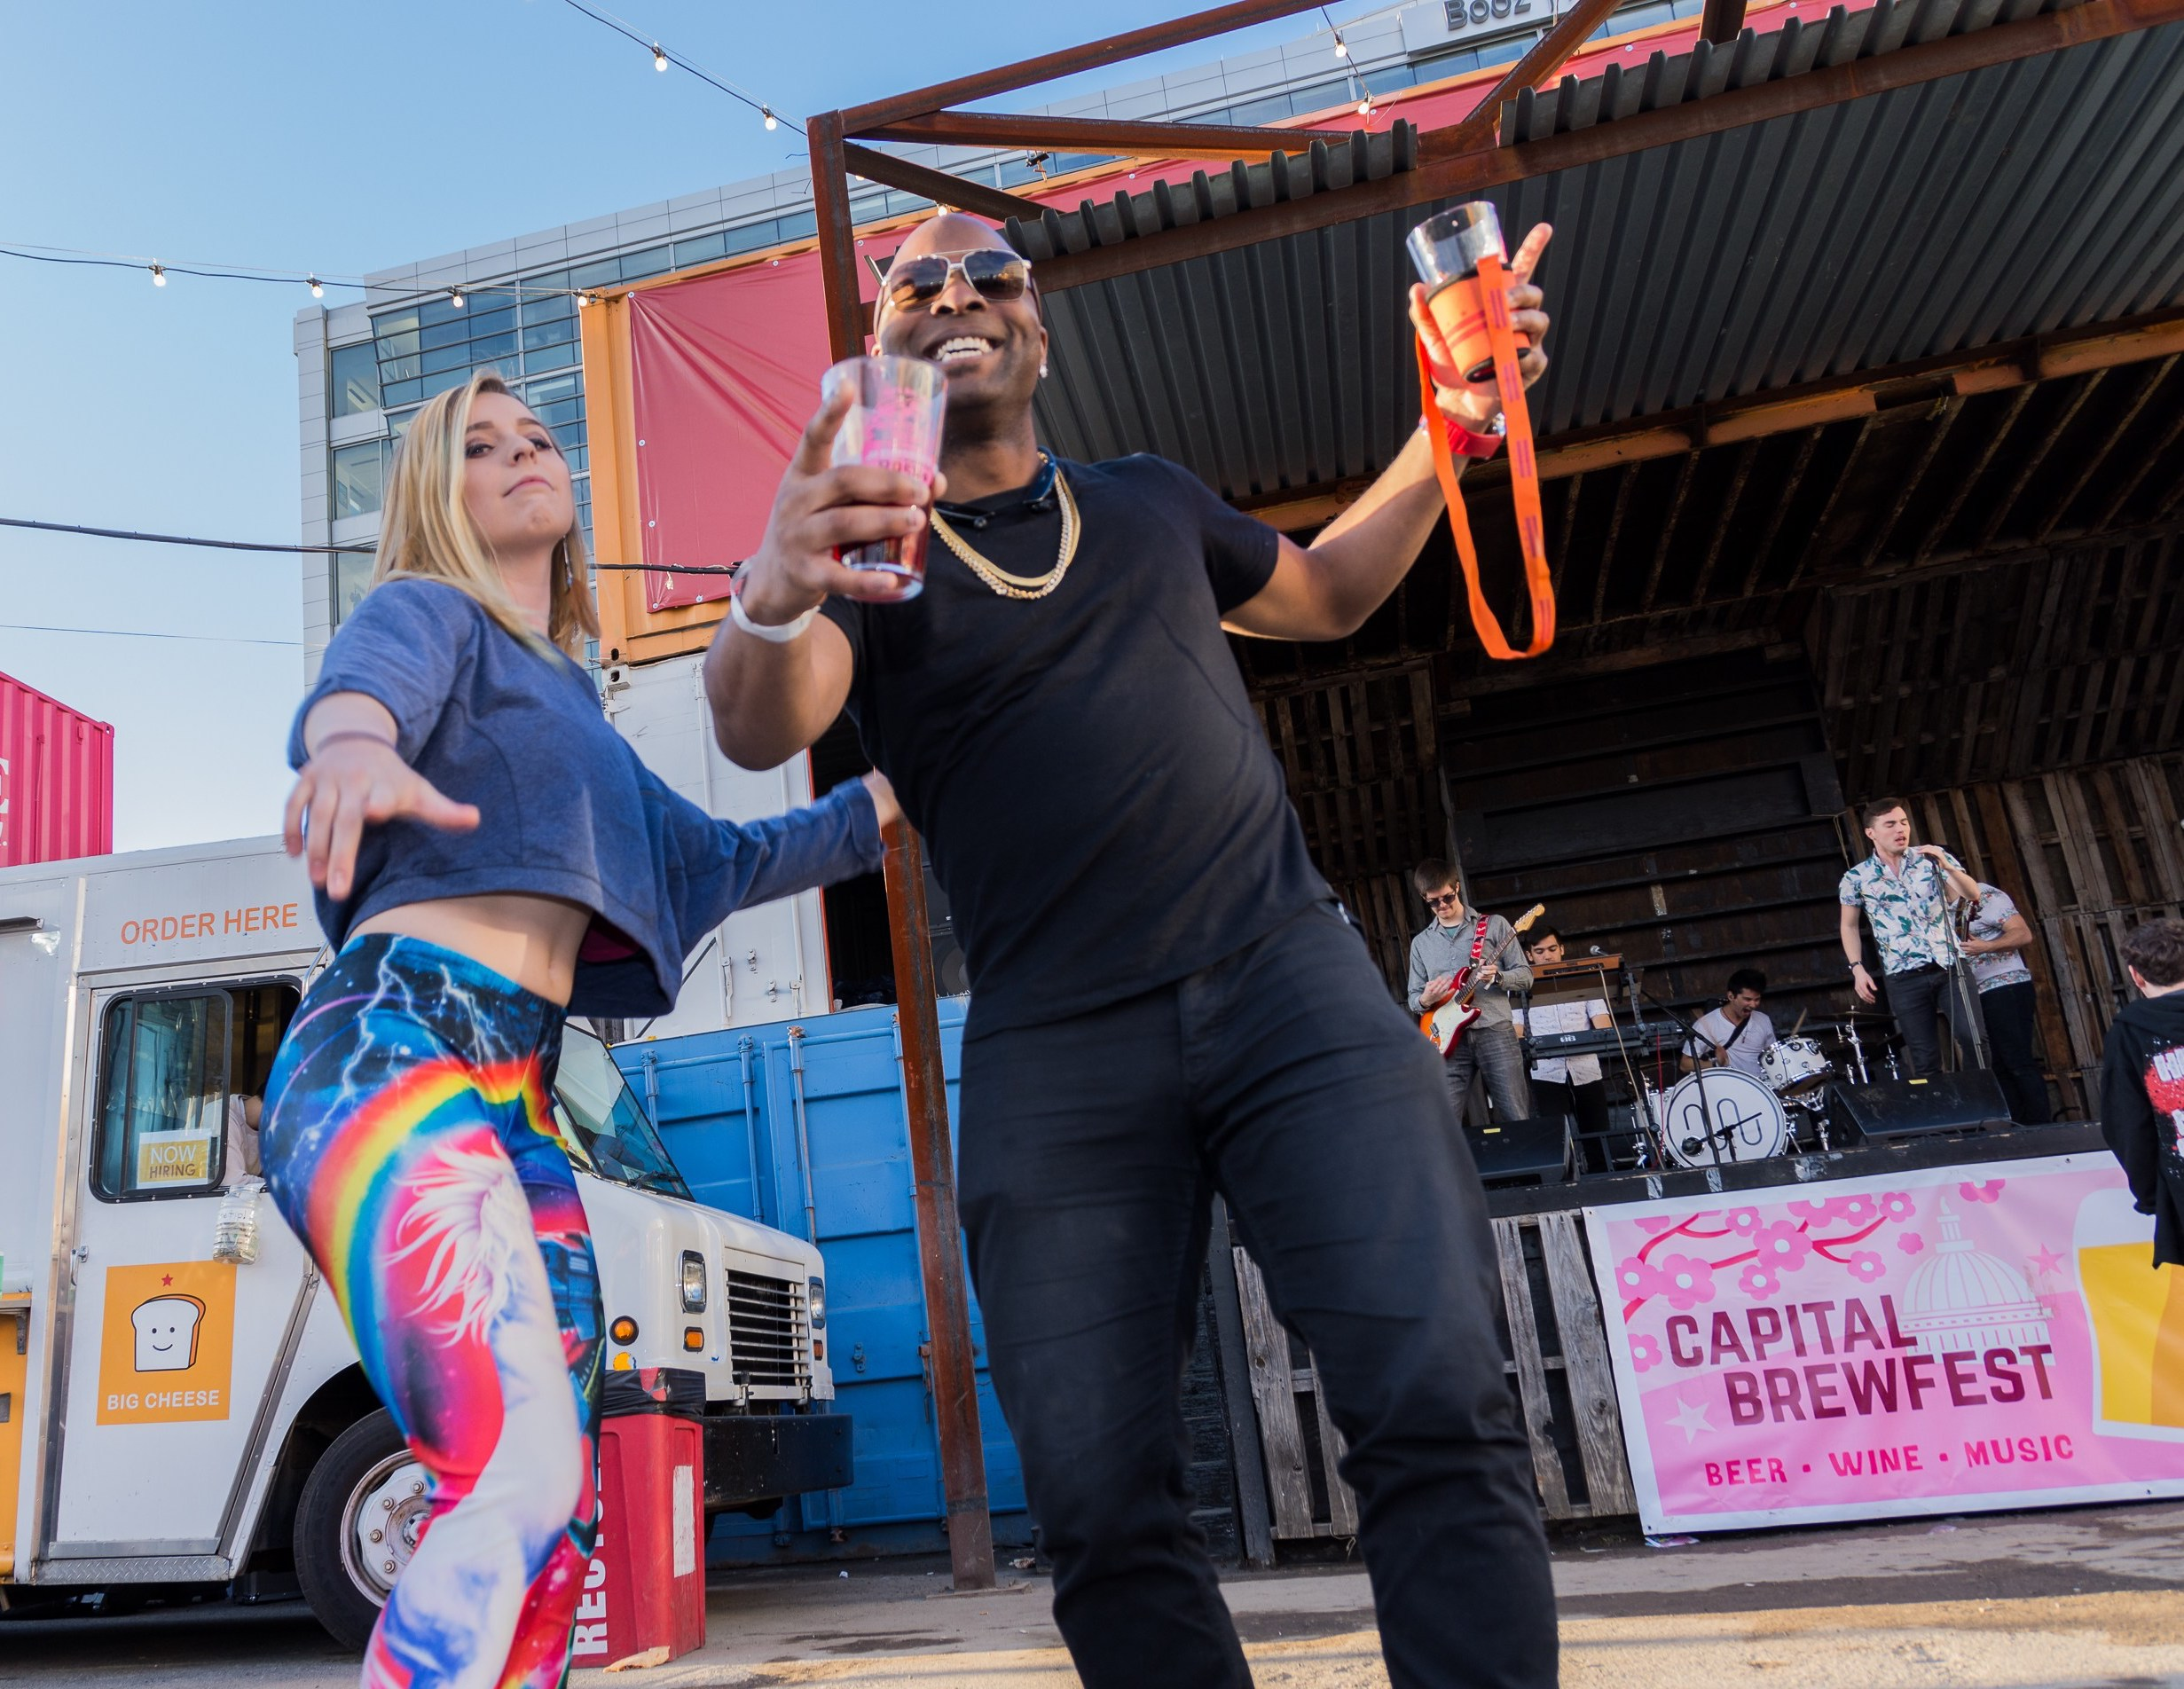 Capital-Brewfest-Blossom-Bash-2017-138.jpeg